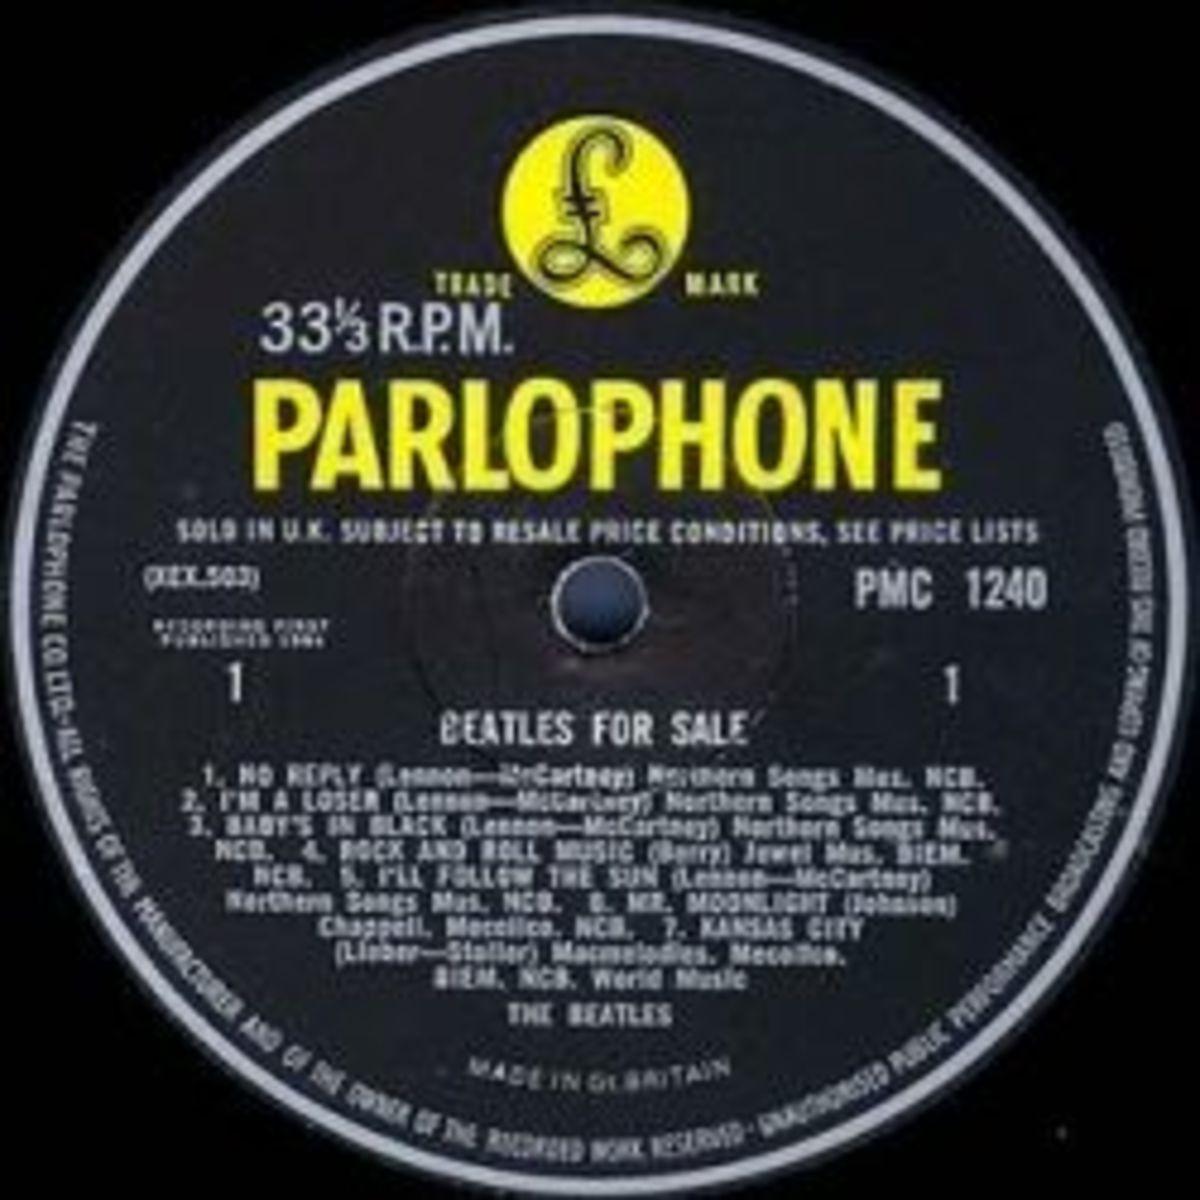 beatlesparlophonerecords